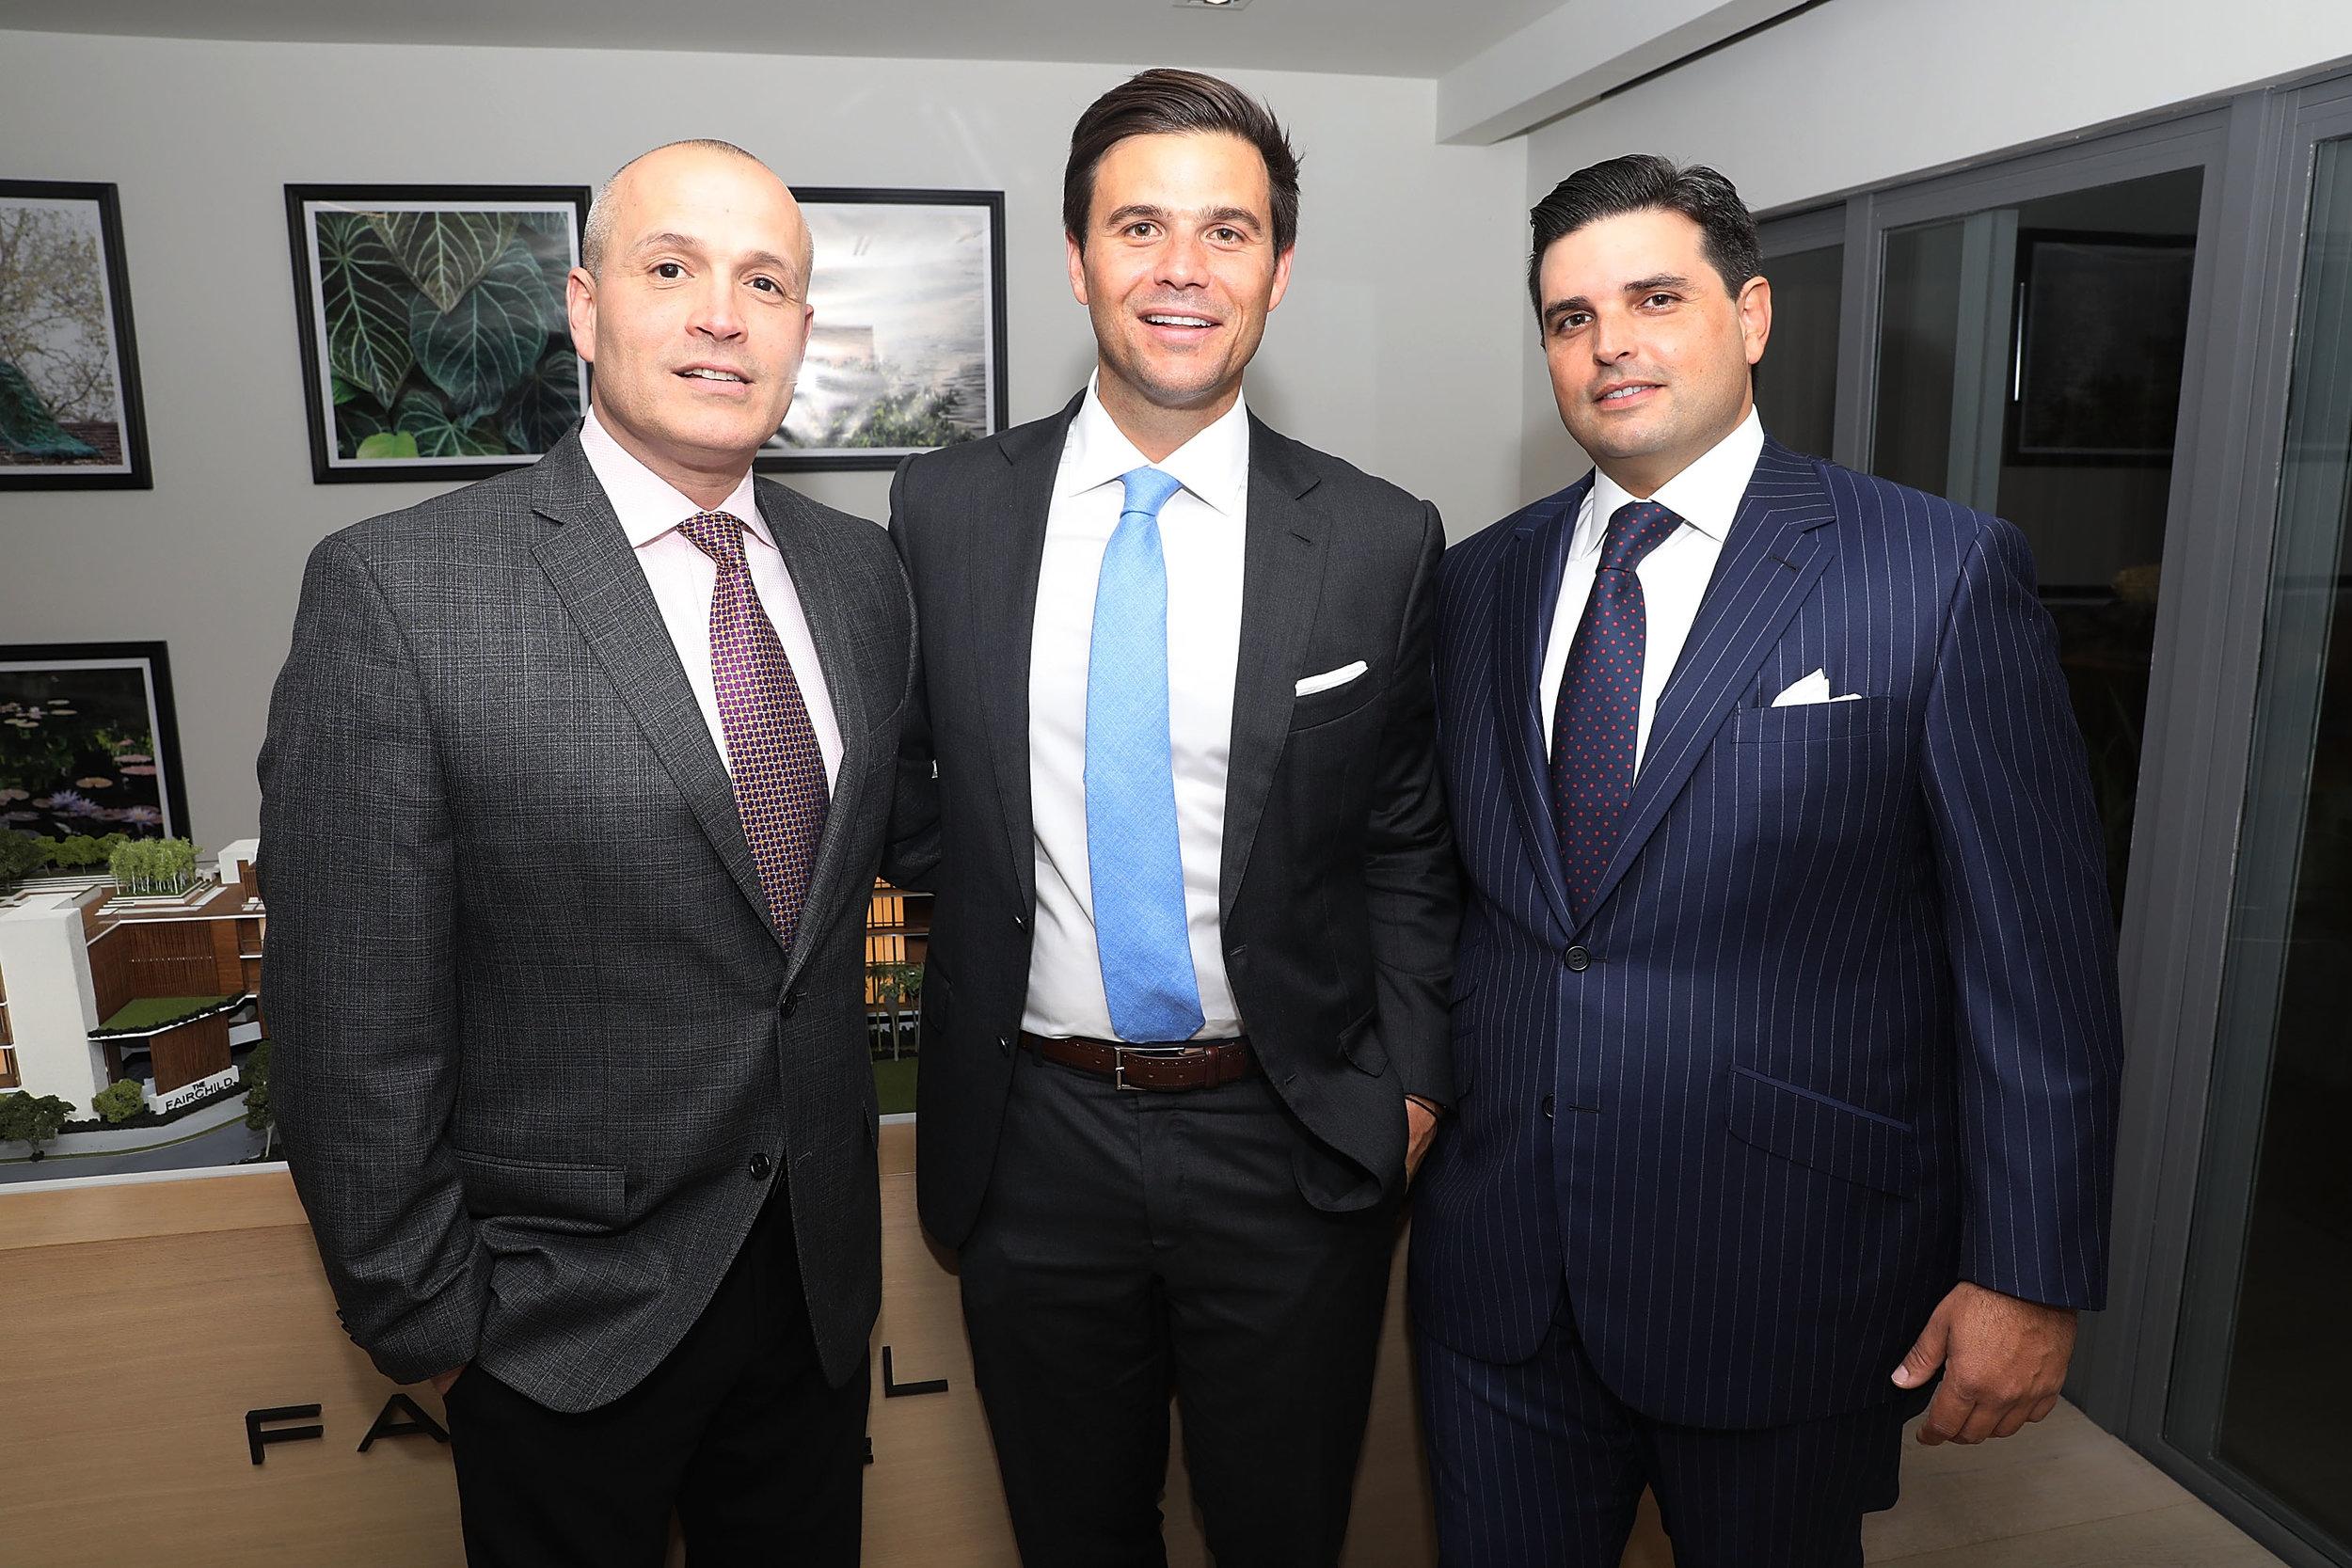 Oscar Rodriguez, Daniel de la Vega and Ricardo Vadia (shown left to right)